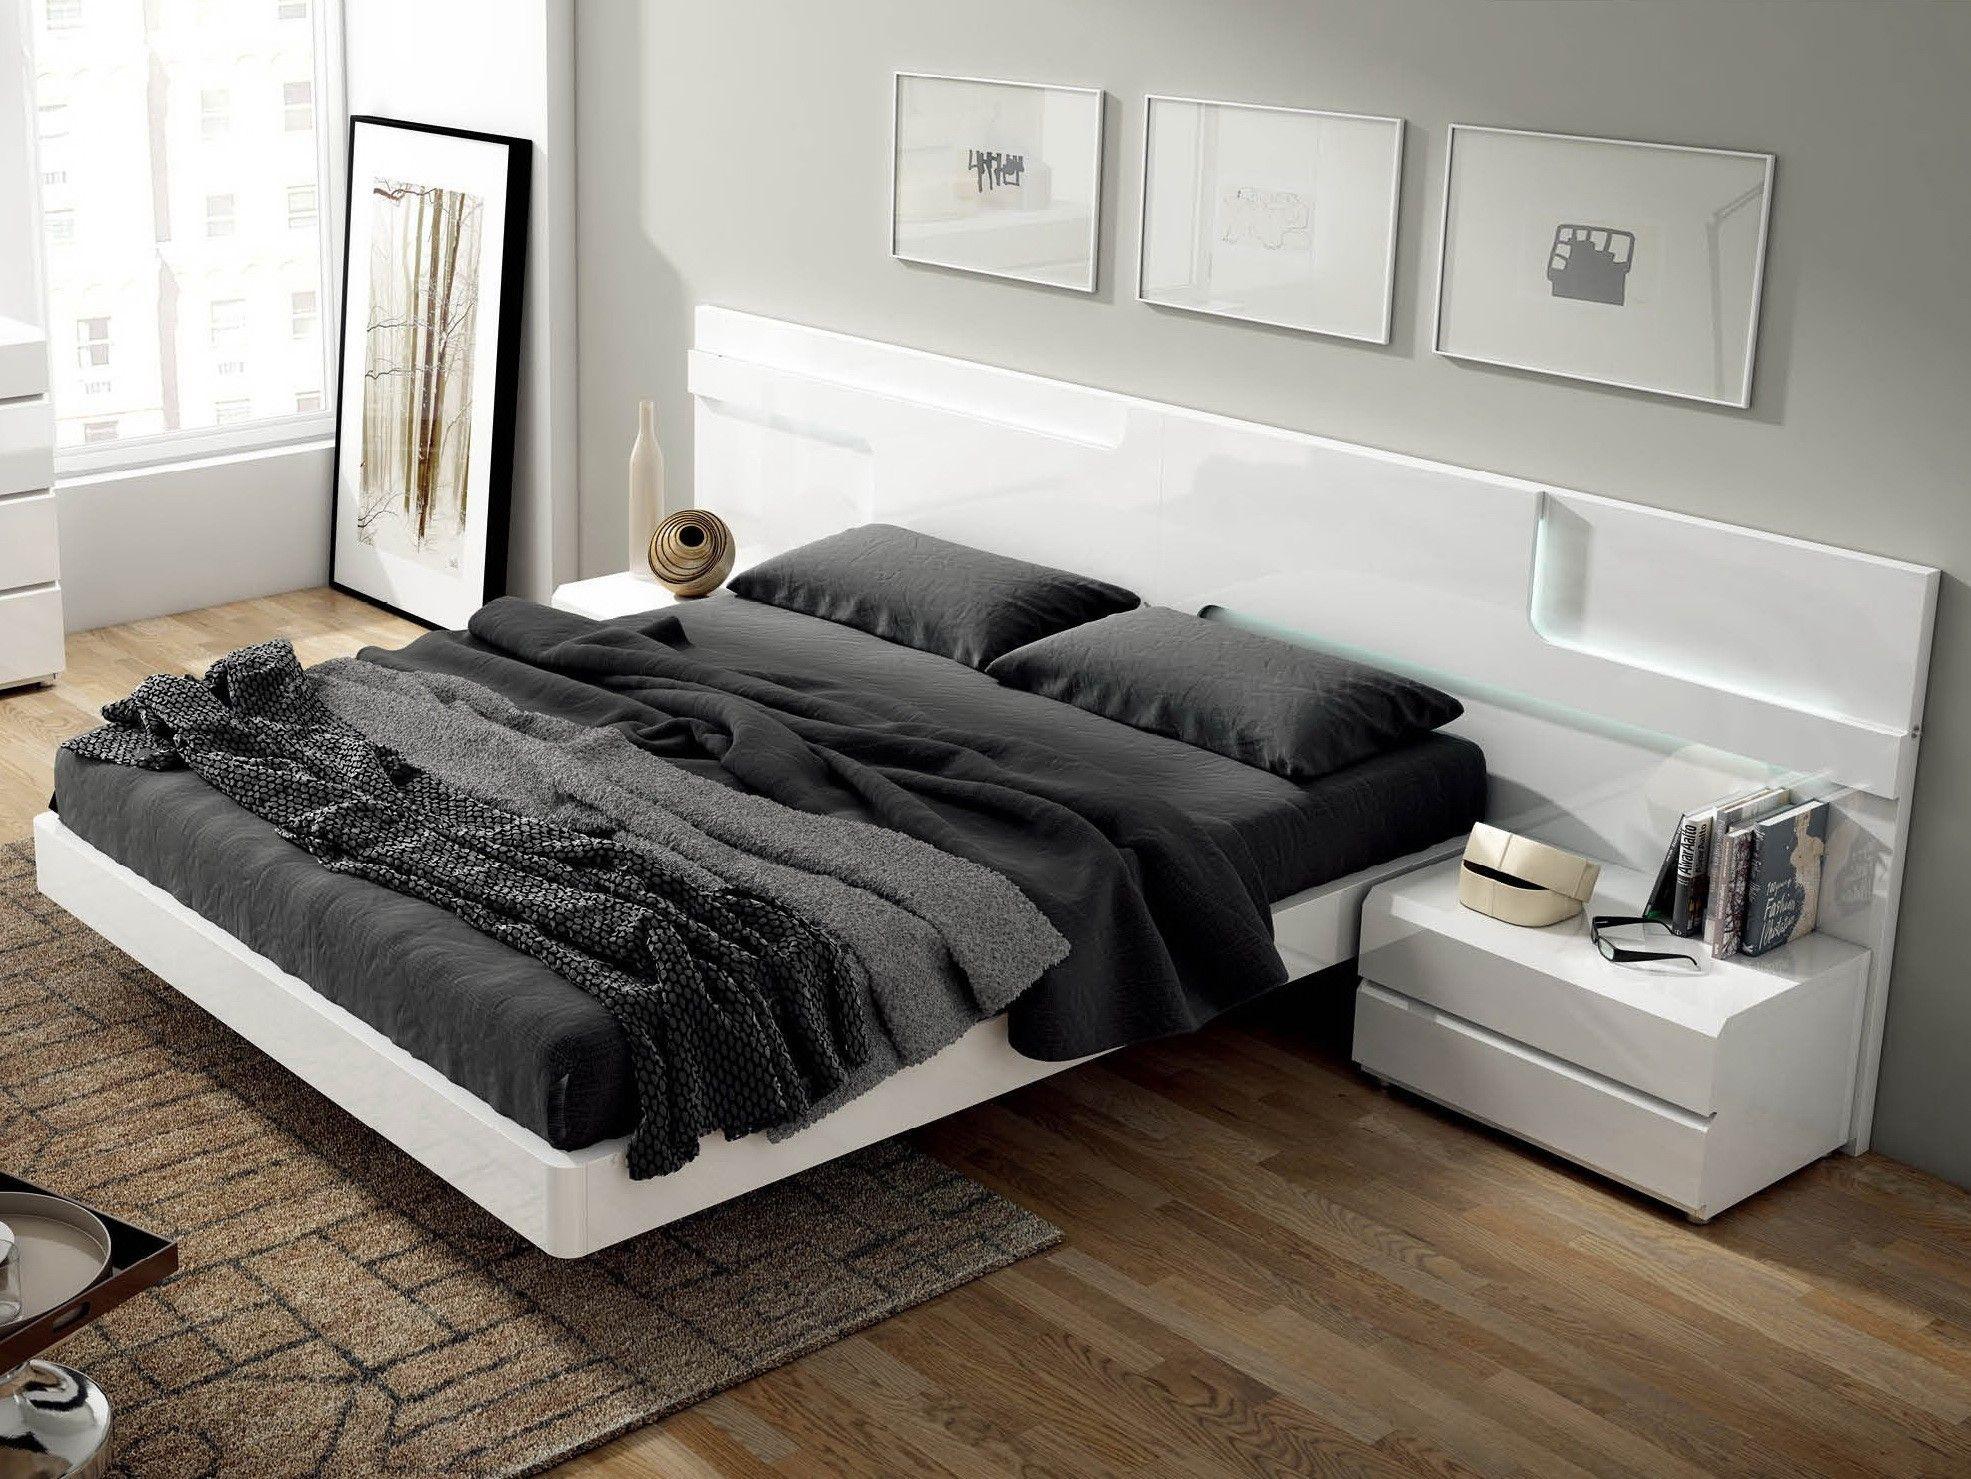 Matrimonio Bed Olympic : Garcia sabate sara bed modern dormitorio